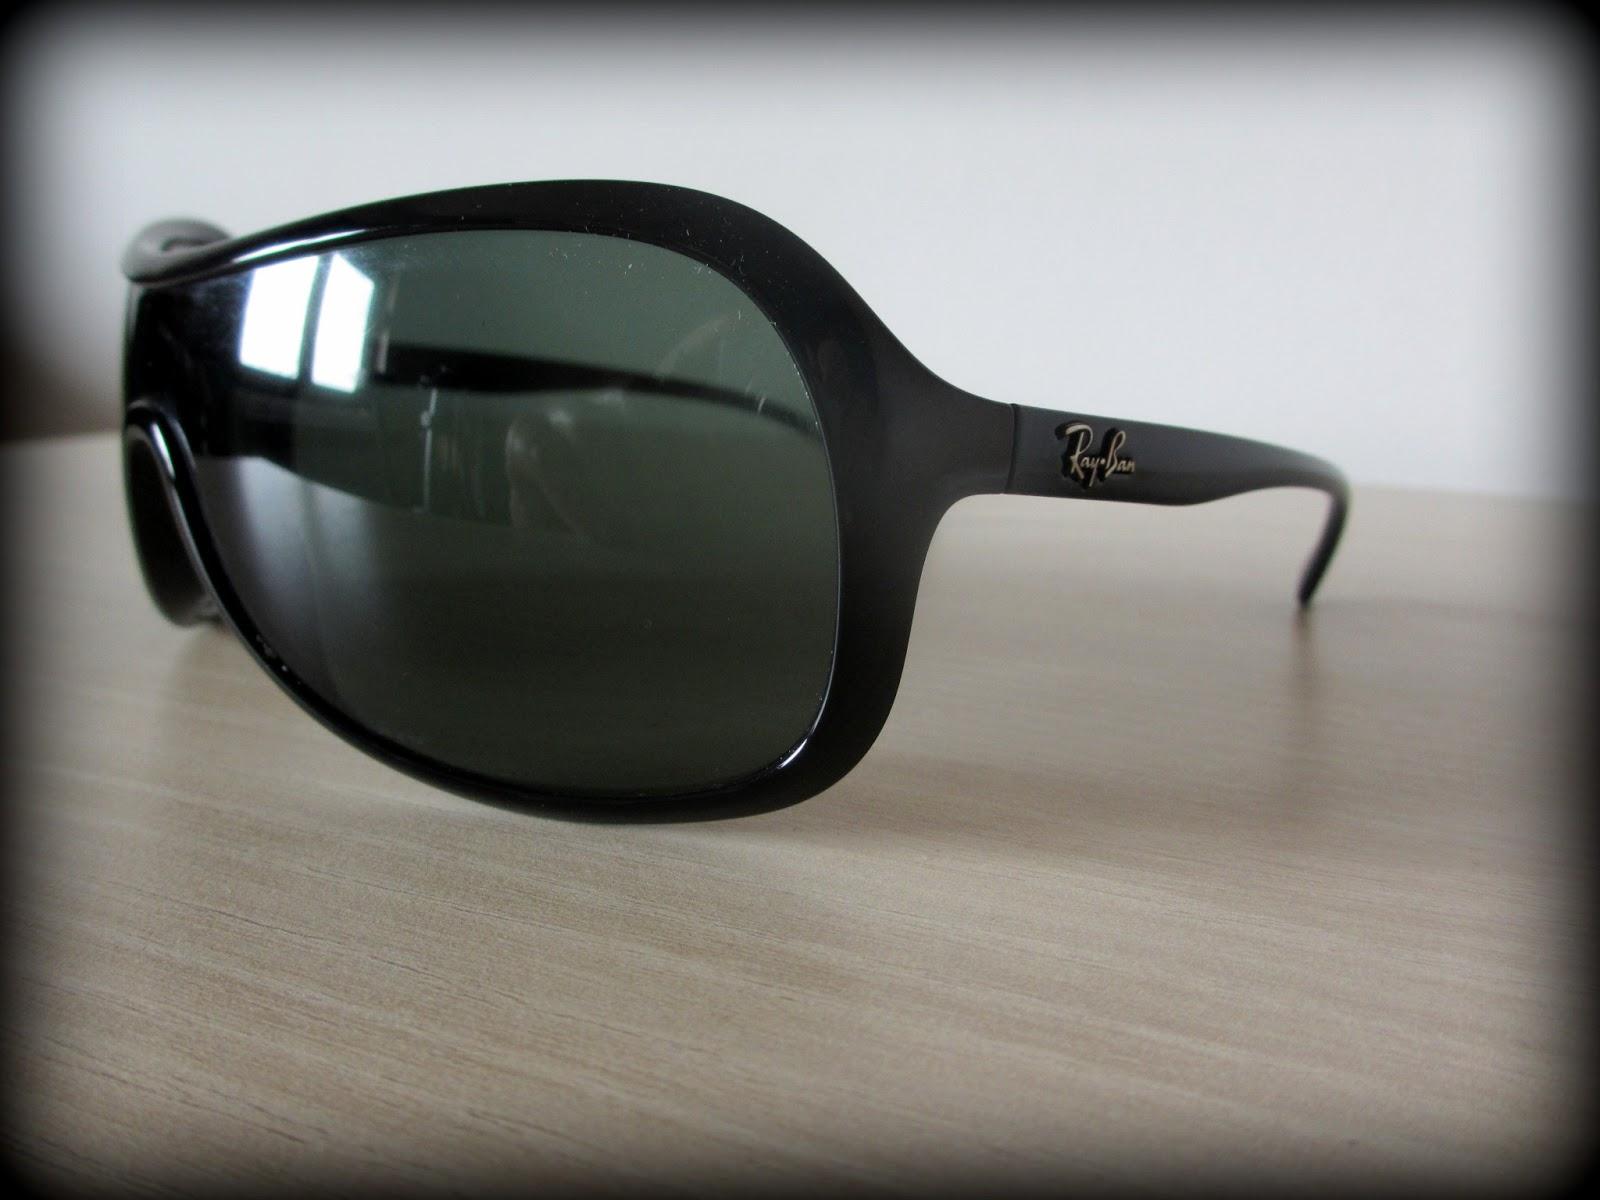 kako prepoznati original ray ban naočale